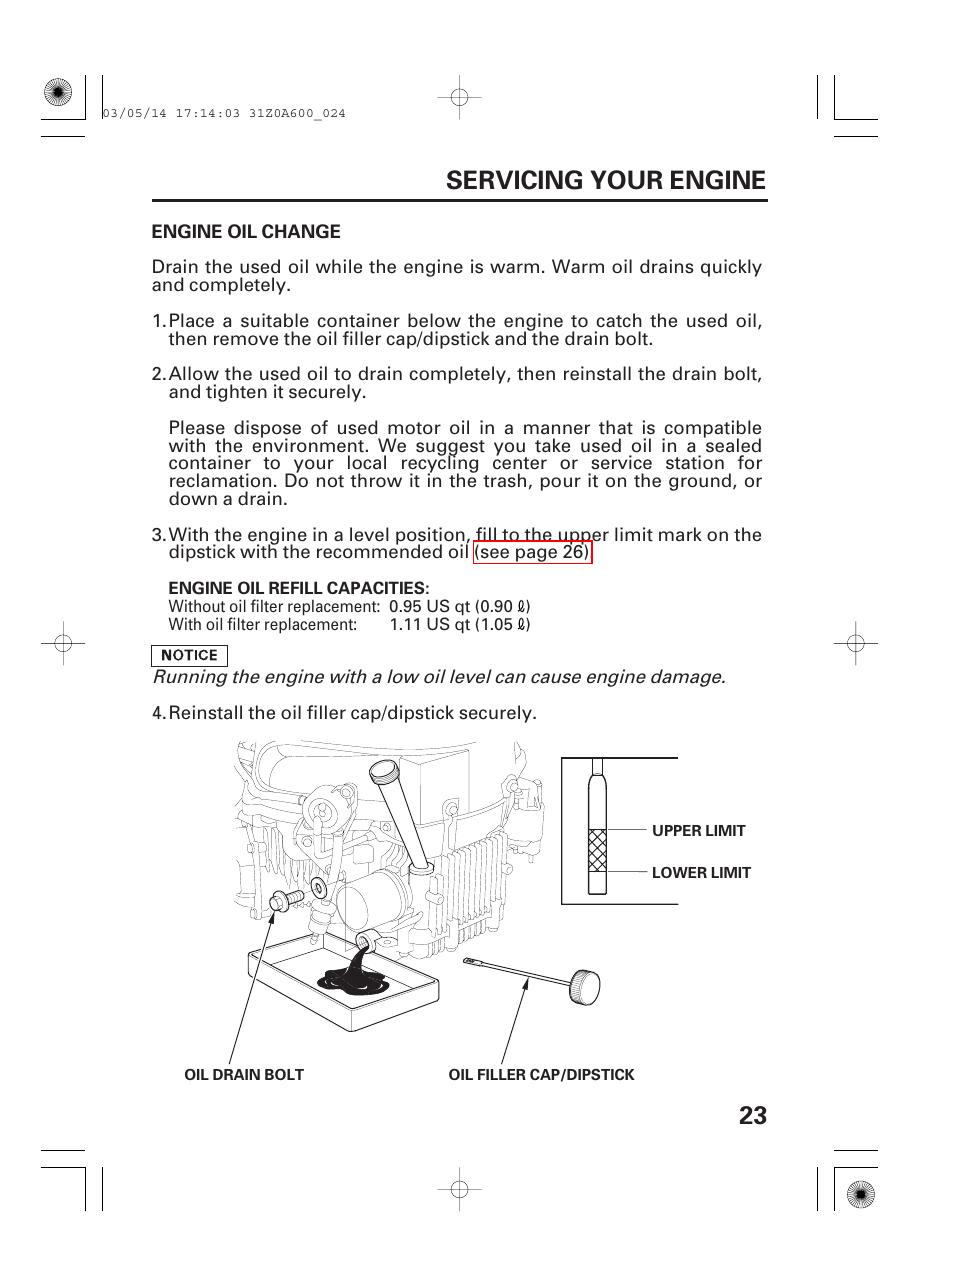 Engine oil change, 23 servicing your engine | HONDA GXV530 User Manual |  Page 25 / 60